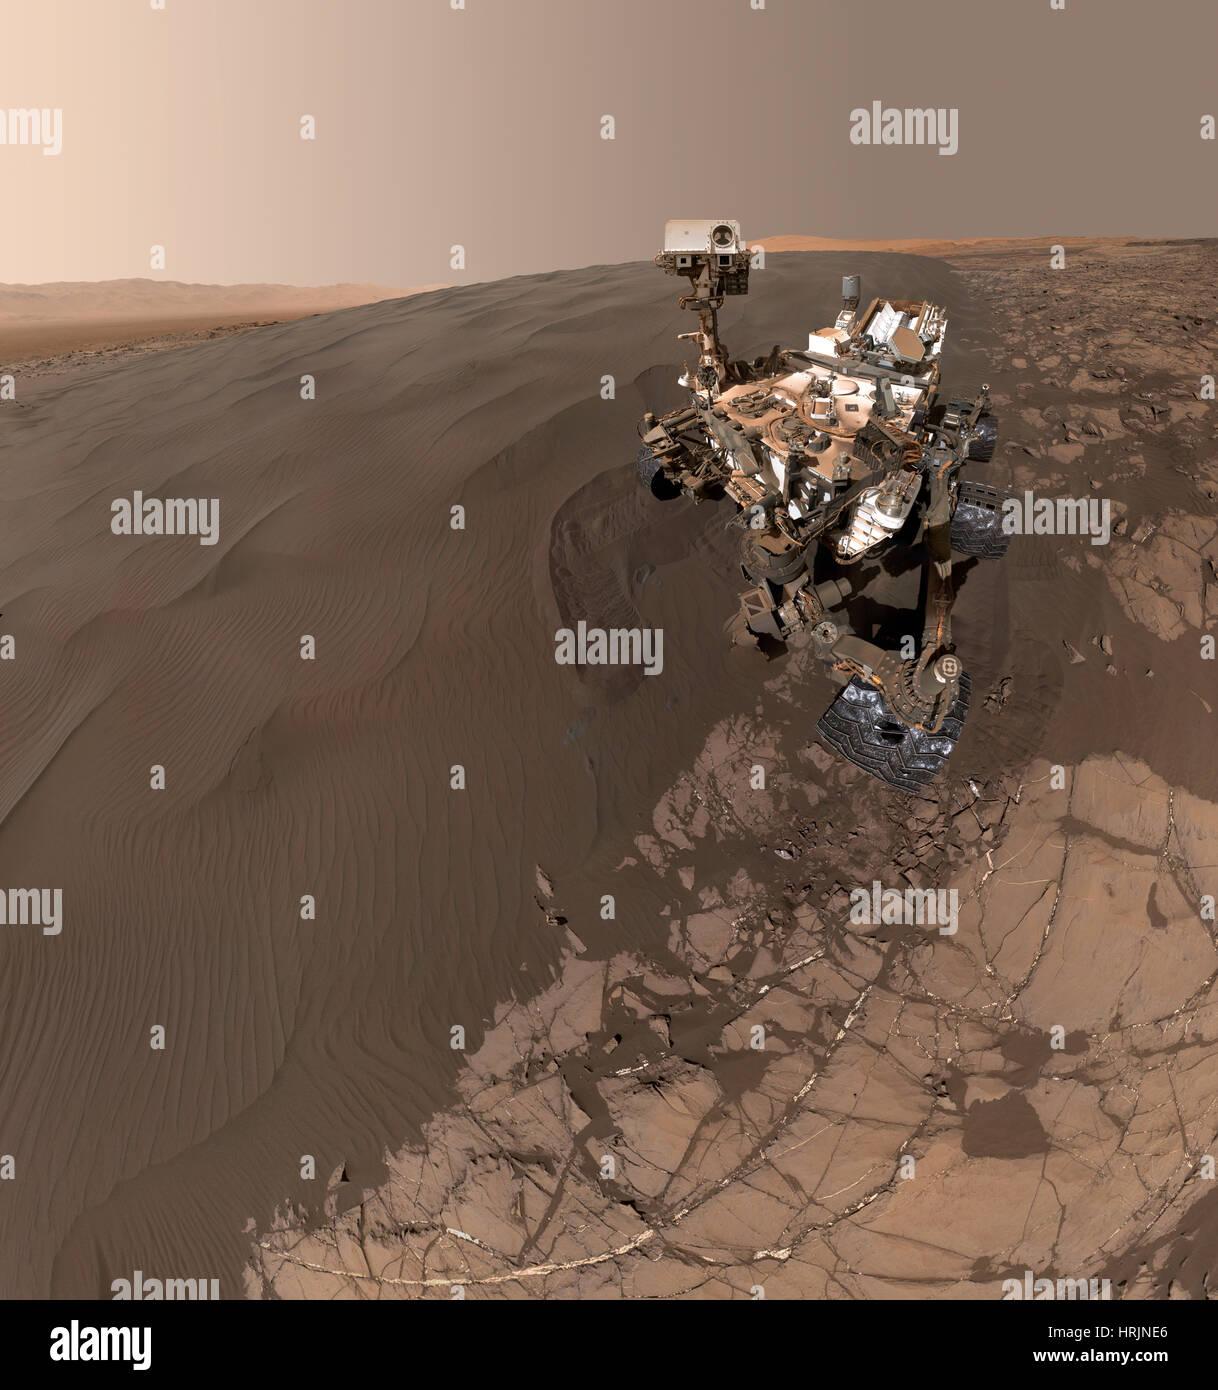 Curiosity Rover Self-Portrait - Stock Image